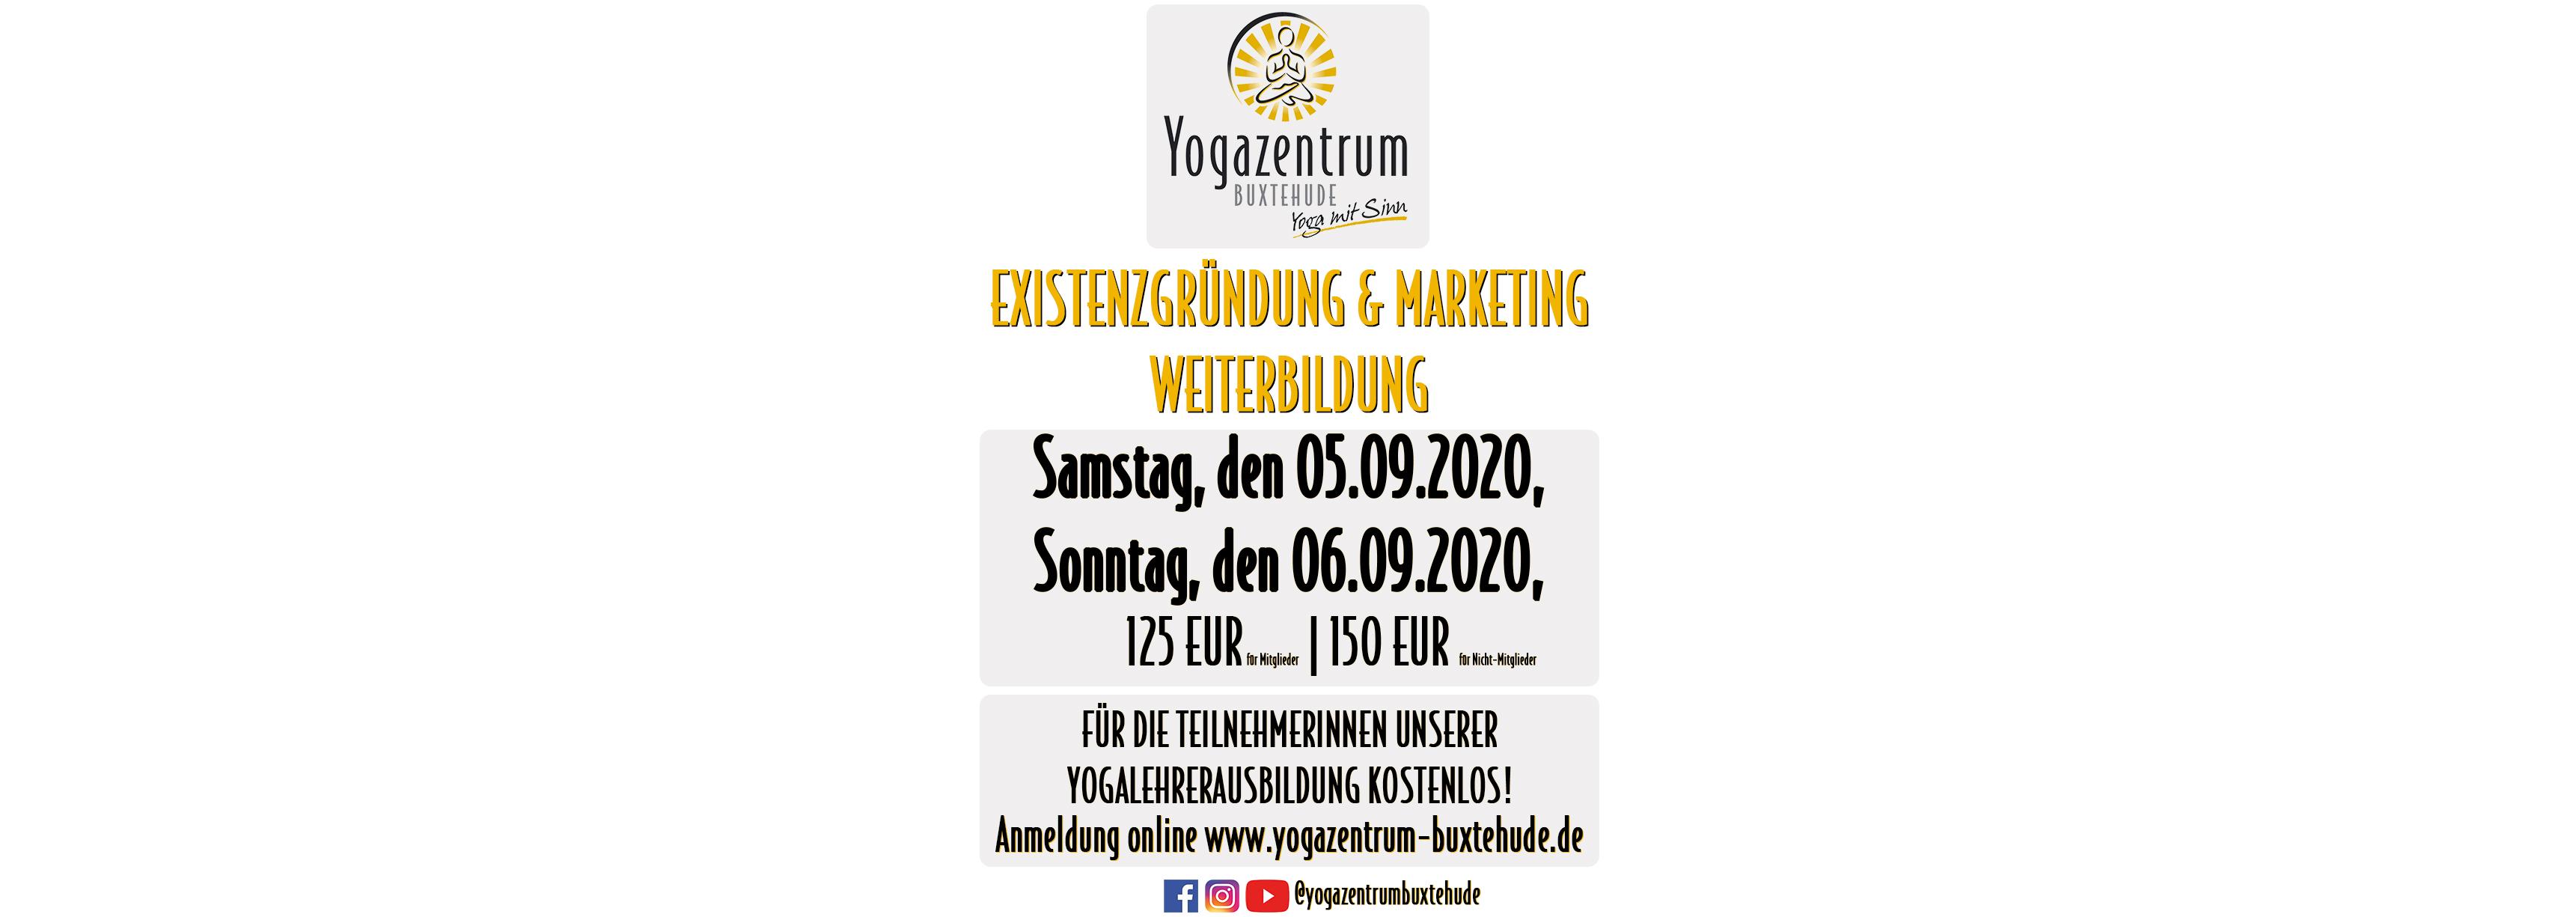 yoga buxtehude existenzgründung marketing yogalehrer